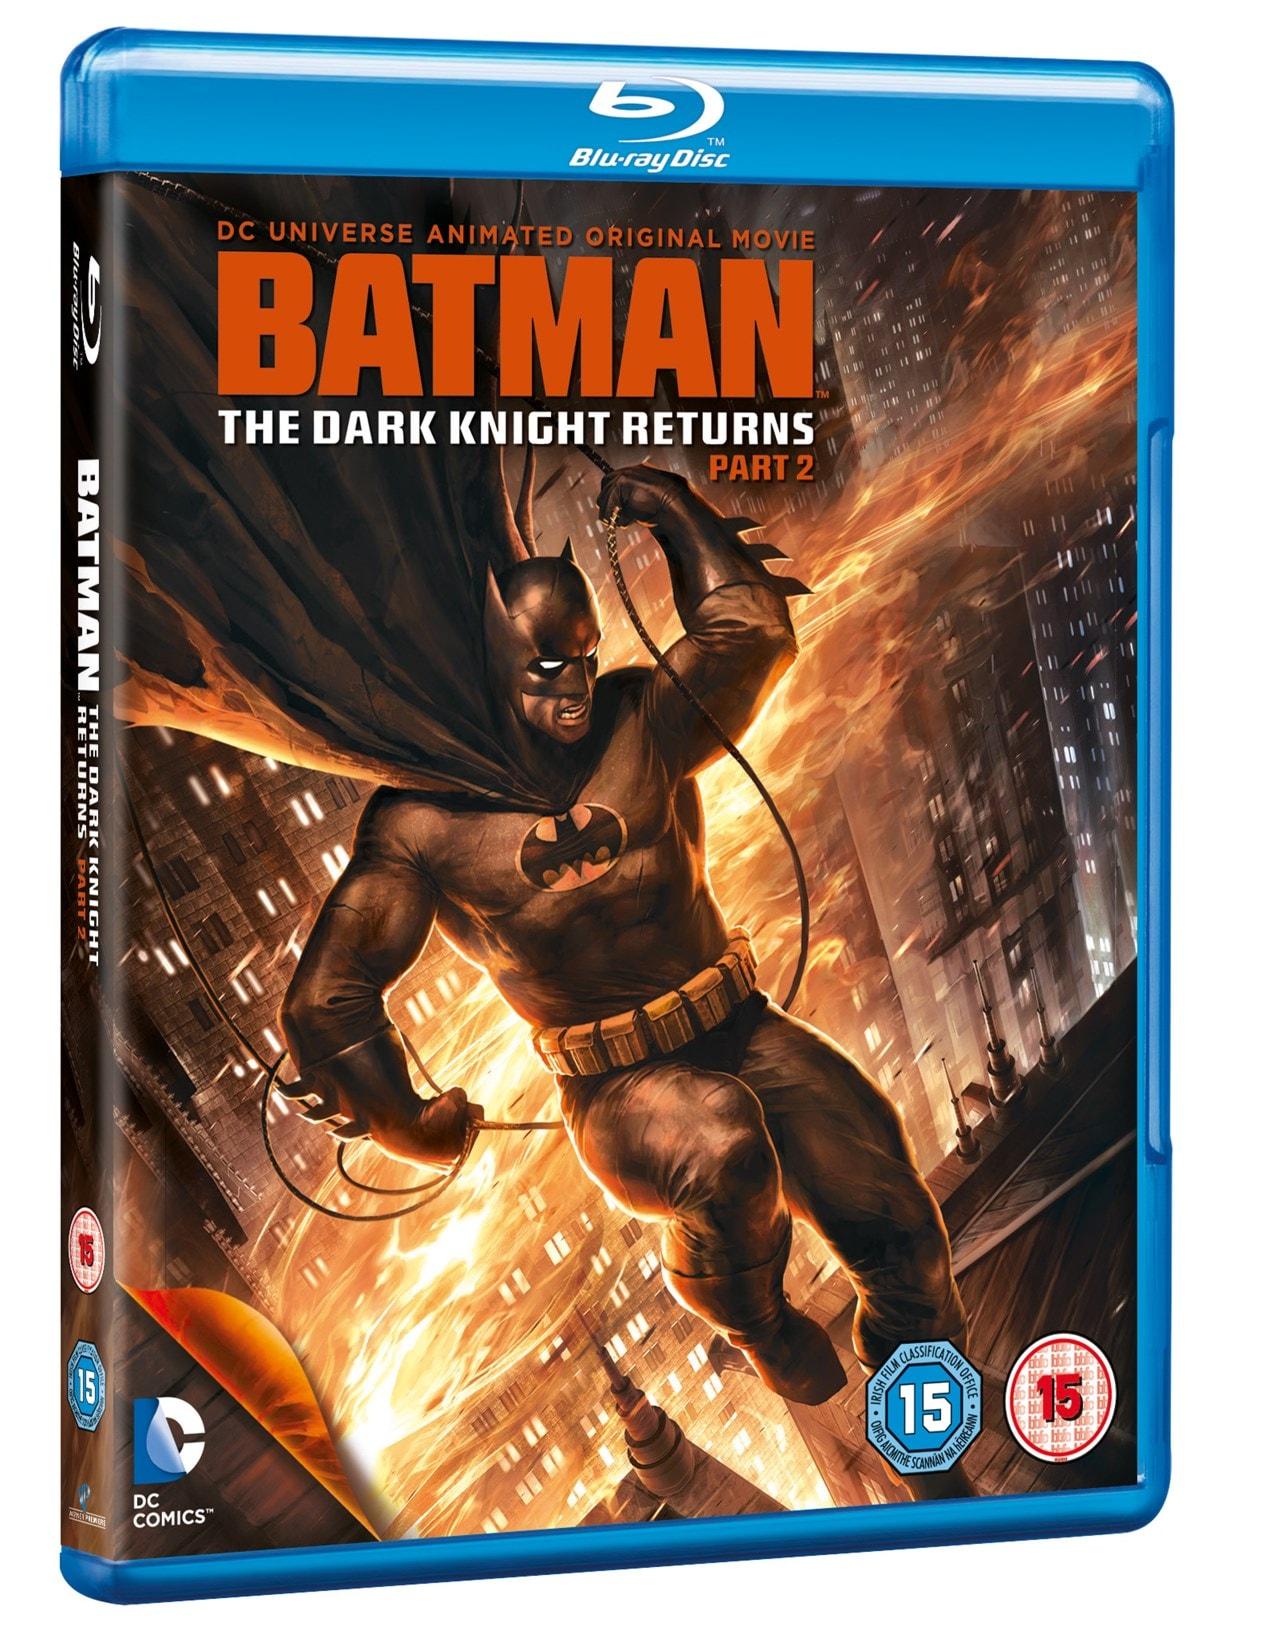 Batman: The Dark Knight Returns - Part 2 - 2